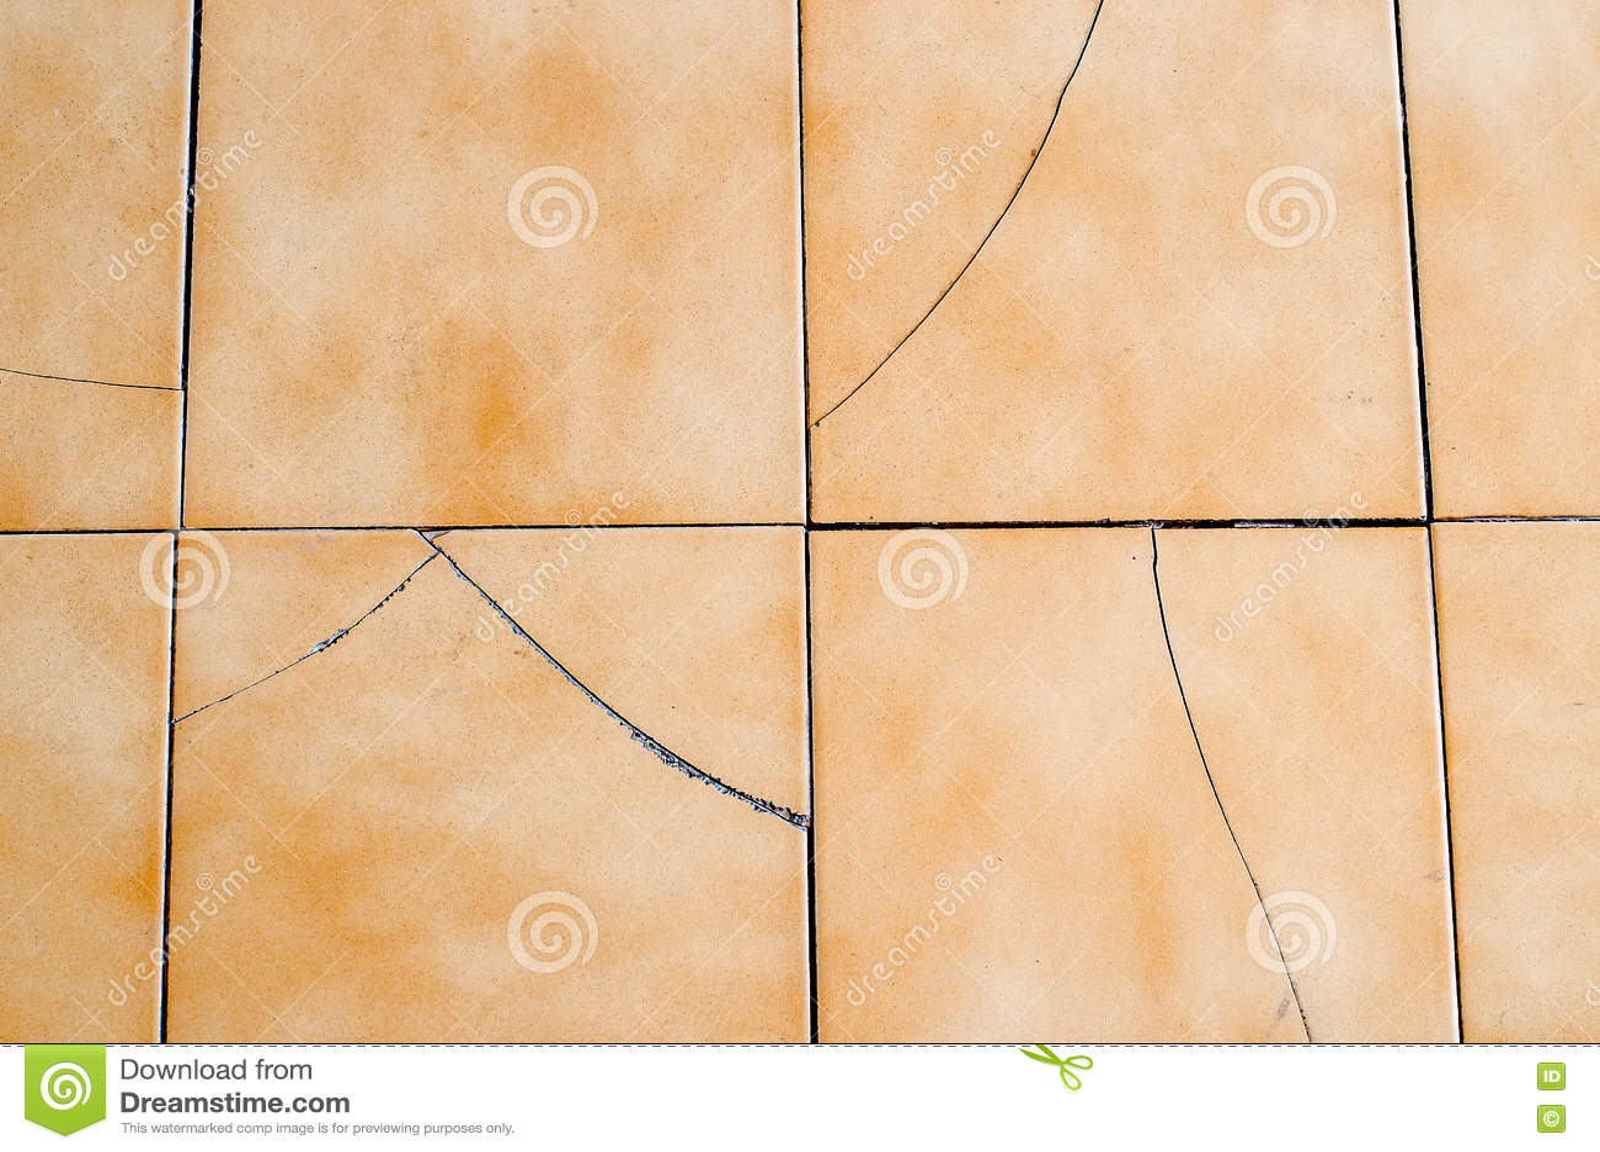 Old and broken asbestos floor tiles stock photo image 73483120 old and broken asbestos floor tiles dailygadgetfo Choice Image